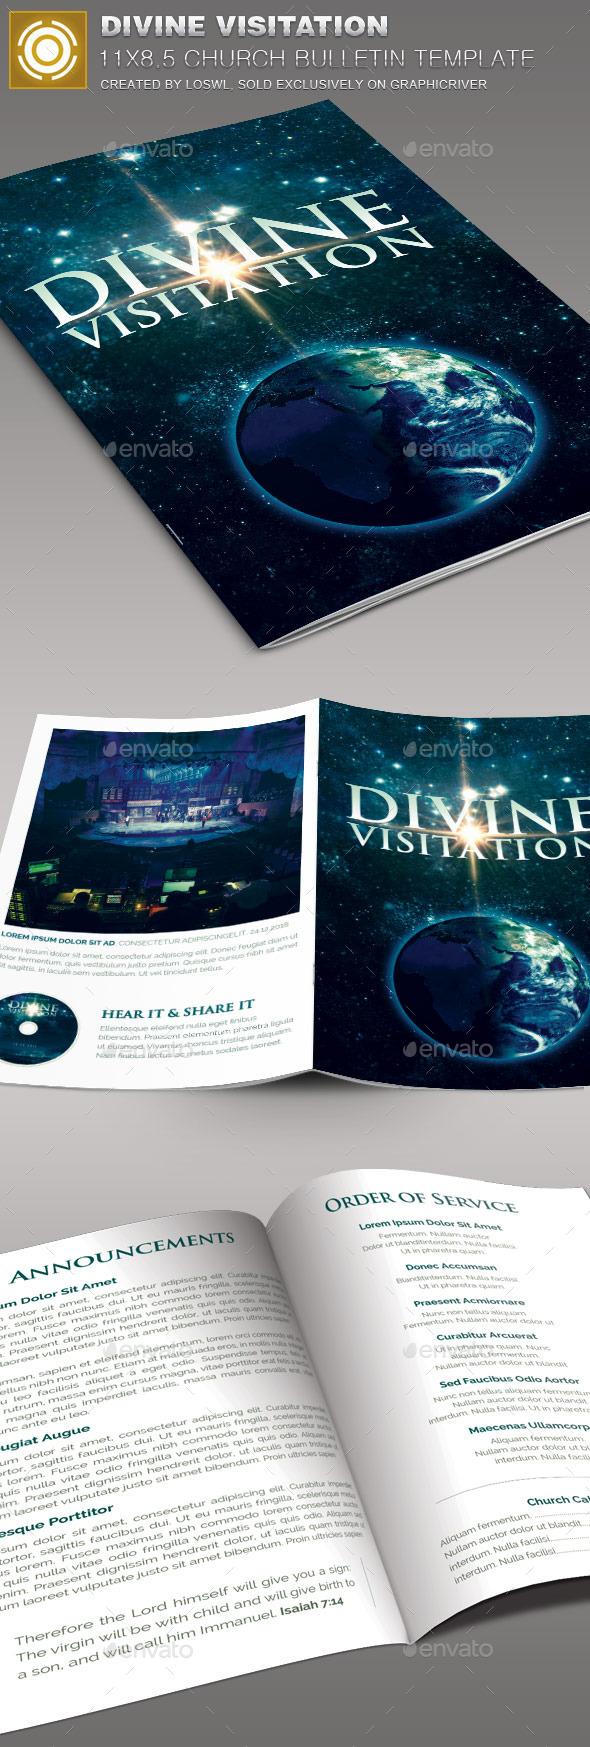 Divine Visitation Church Bulletin Template - Informational Brochures